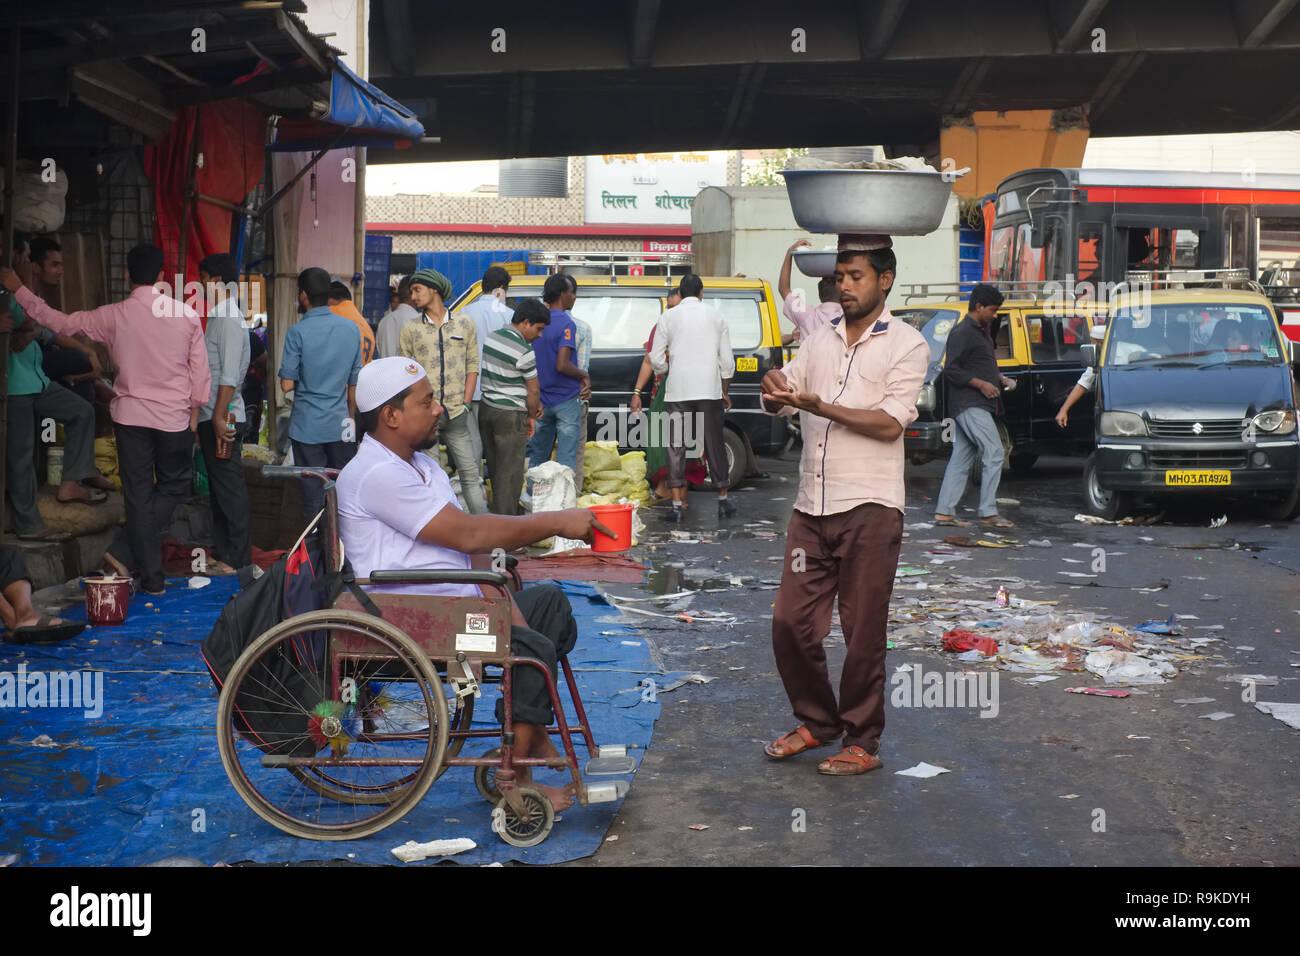 Un portero en un mercado de pescado en Mumbai, India, aproximadamente a mano una pequeña suma de dinero a un mendigo Imagen De Stock